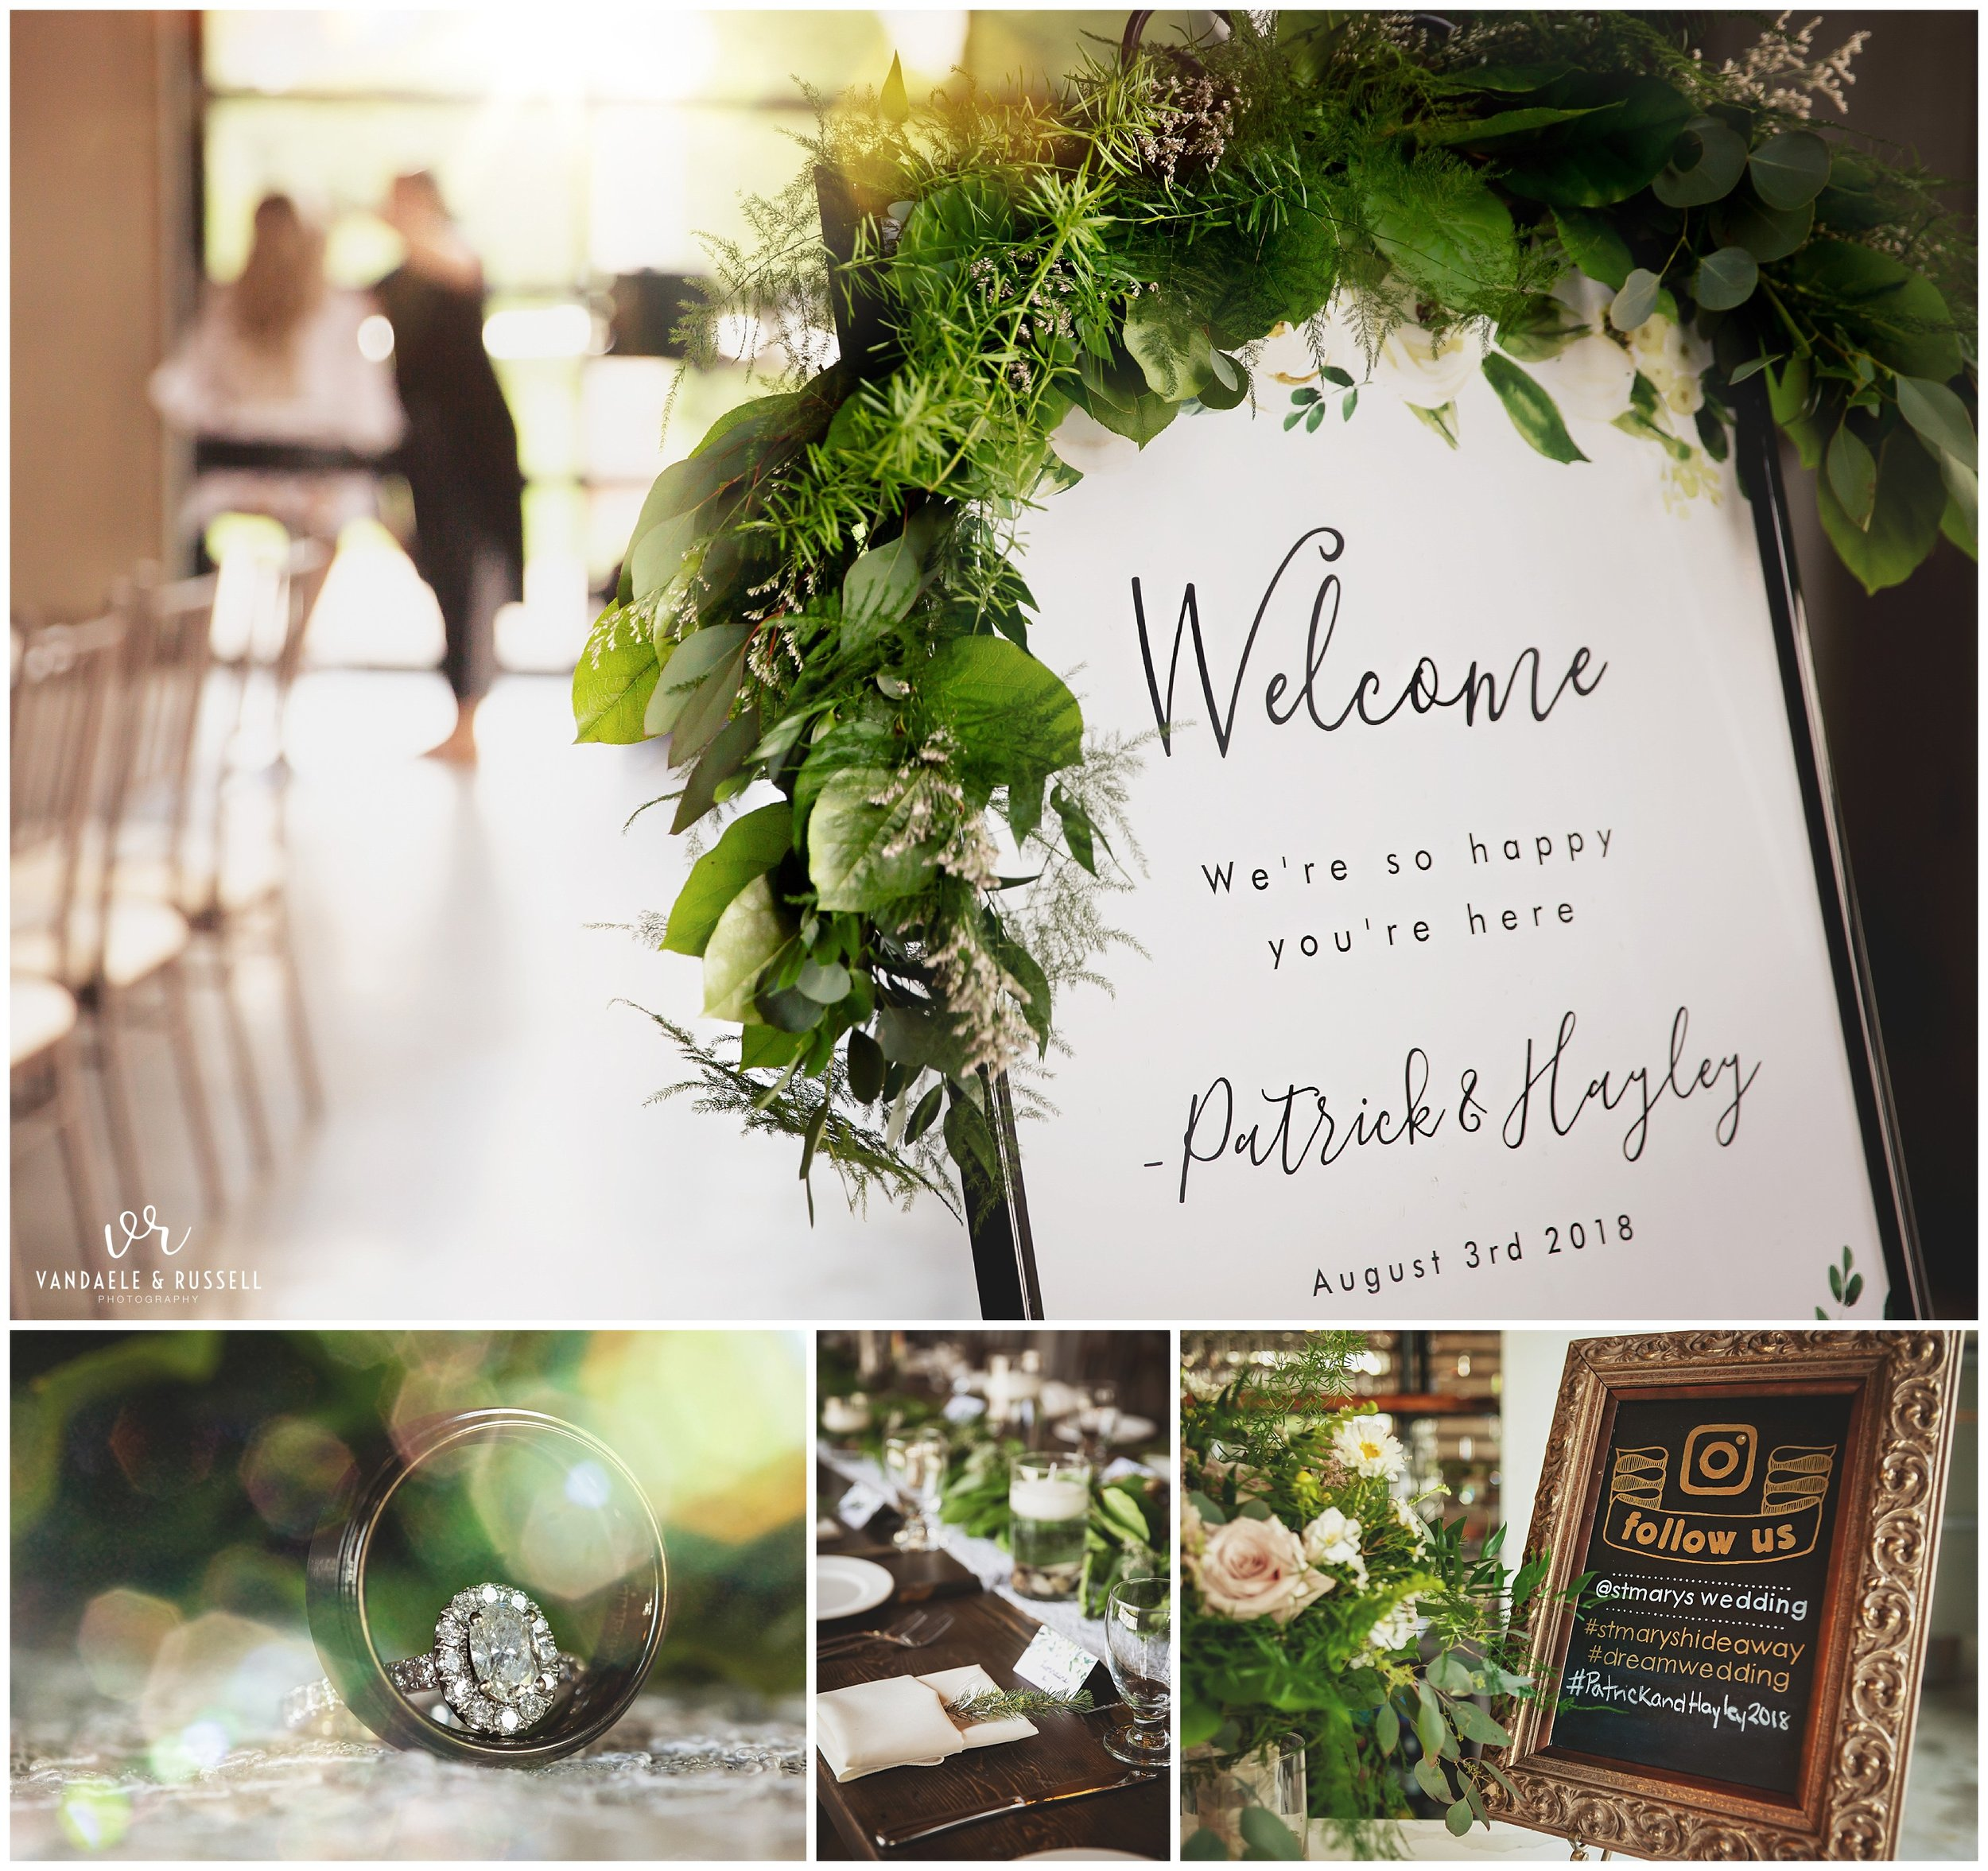 VanDaele-Russell-Wedding-Photography-London-Toronto-Ontario_0147.jpg